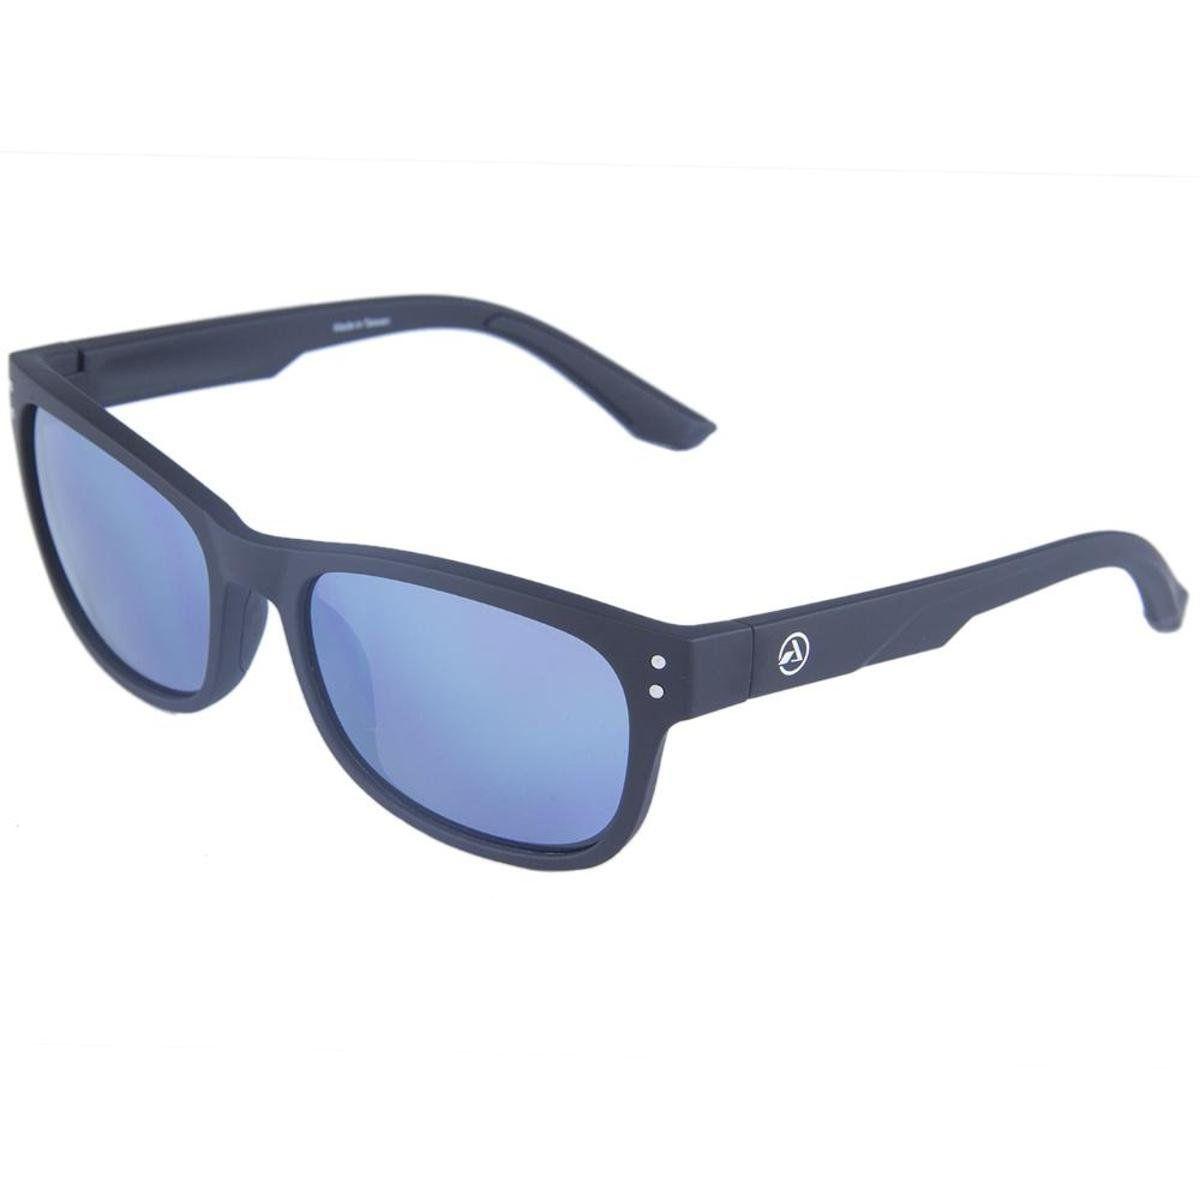 Oculos Absolute After preto lente azul - tipo casual